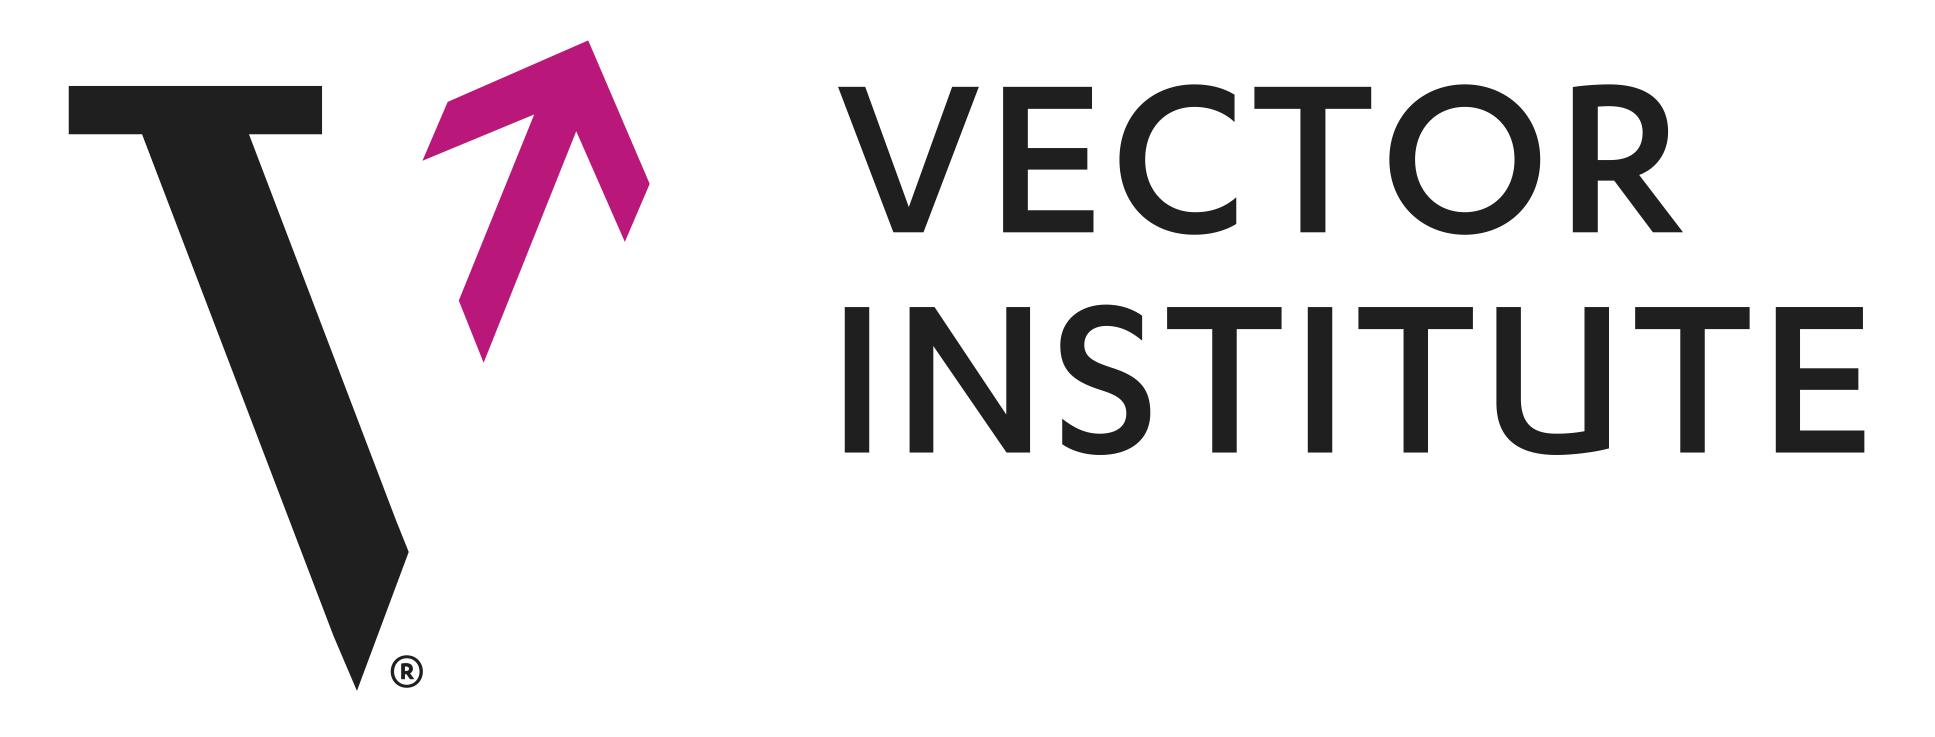 Vector Institute.png